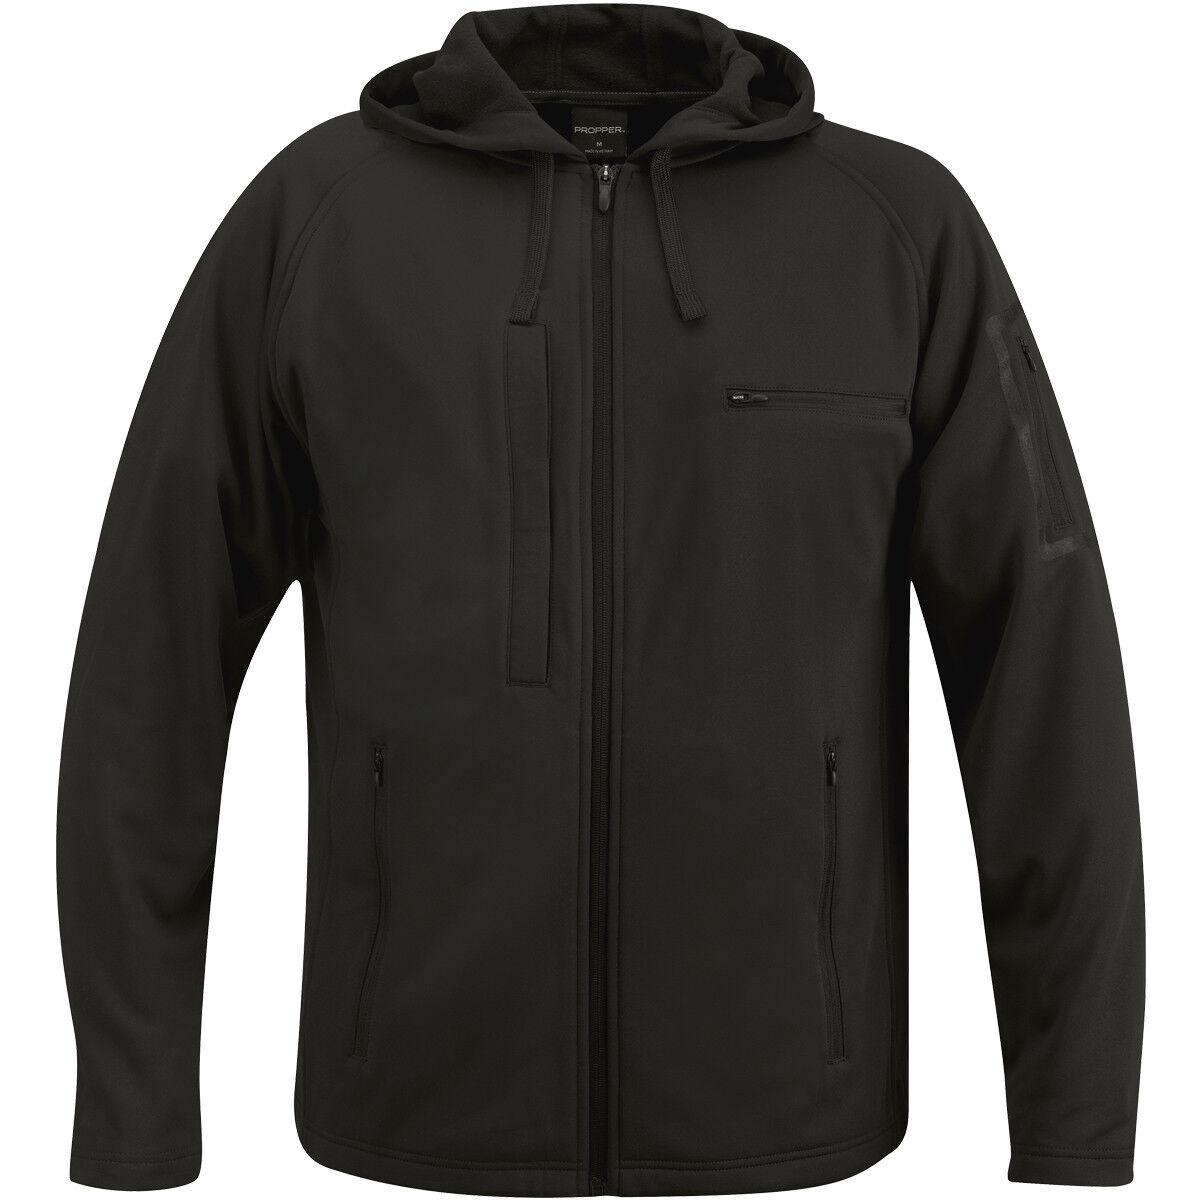 Proper 314 Hoog Sweatshirt mannens CCW PoliBinden Beveiliging Uniform Duty Jumper Zwart